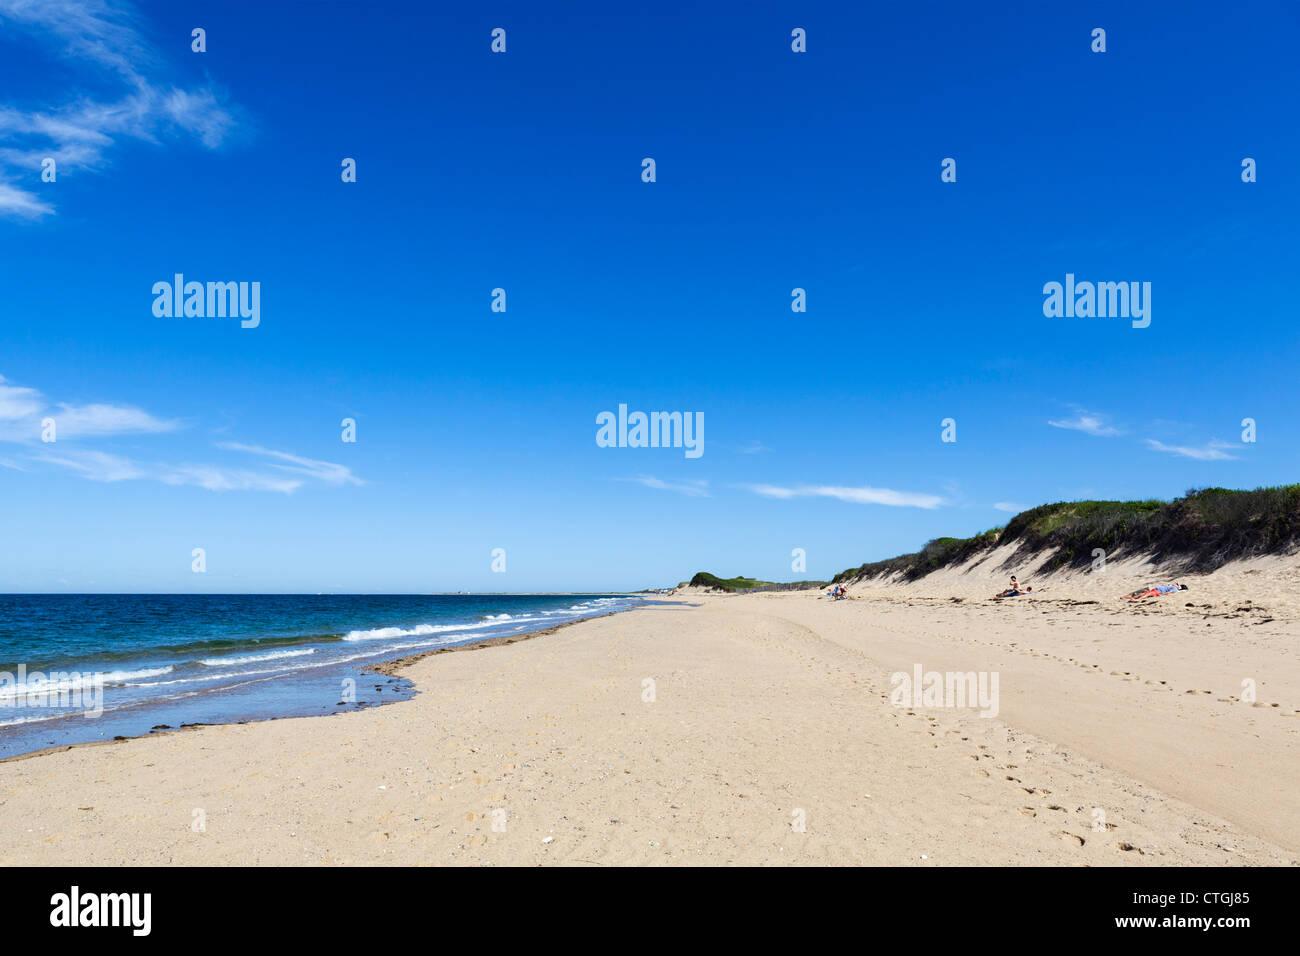 Herring Cove Beach, Cape Cod National Seashore, Cape Cod, Massachusetts, USA - Stock Image